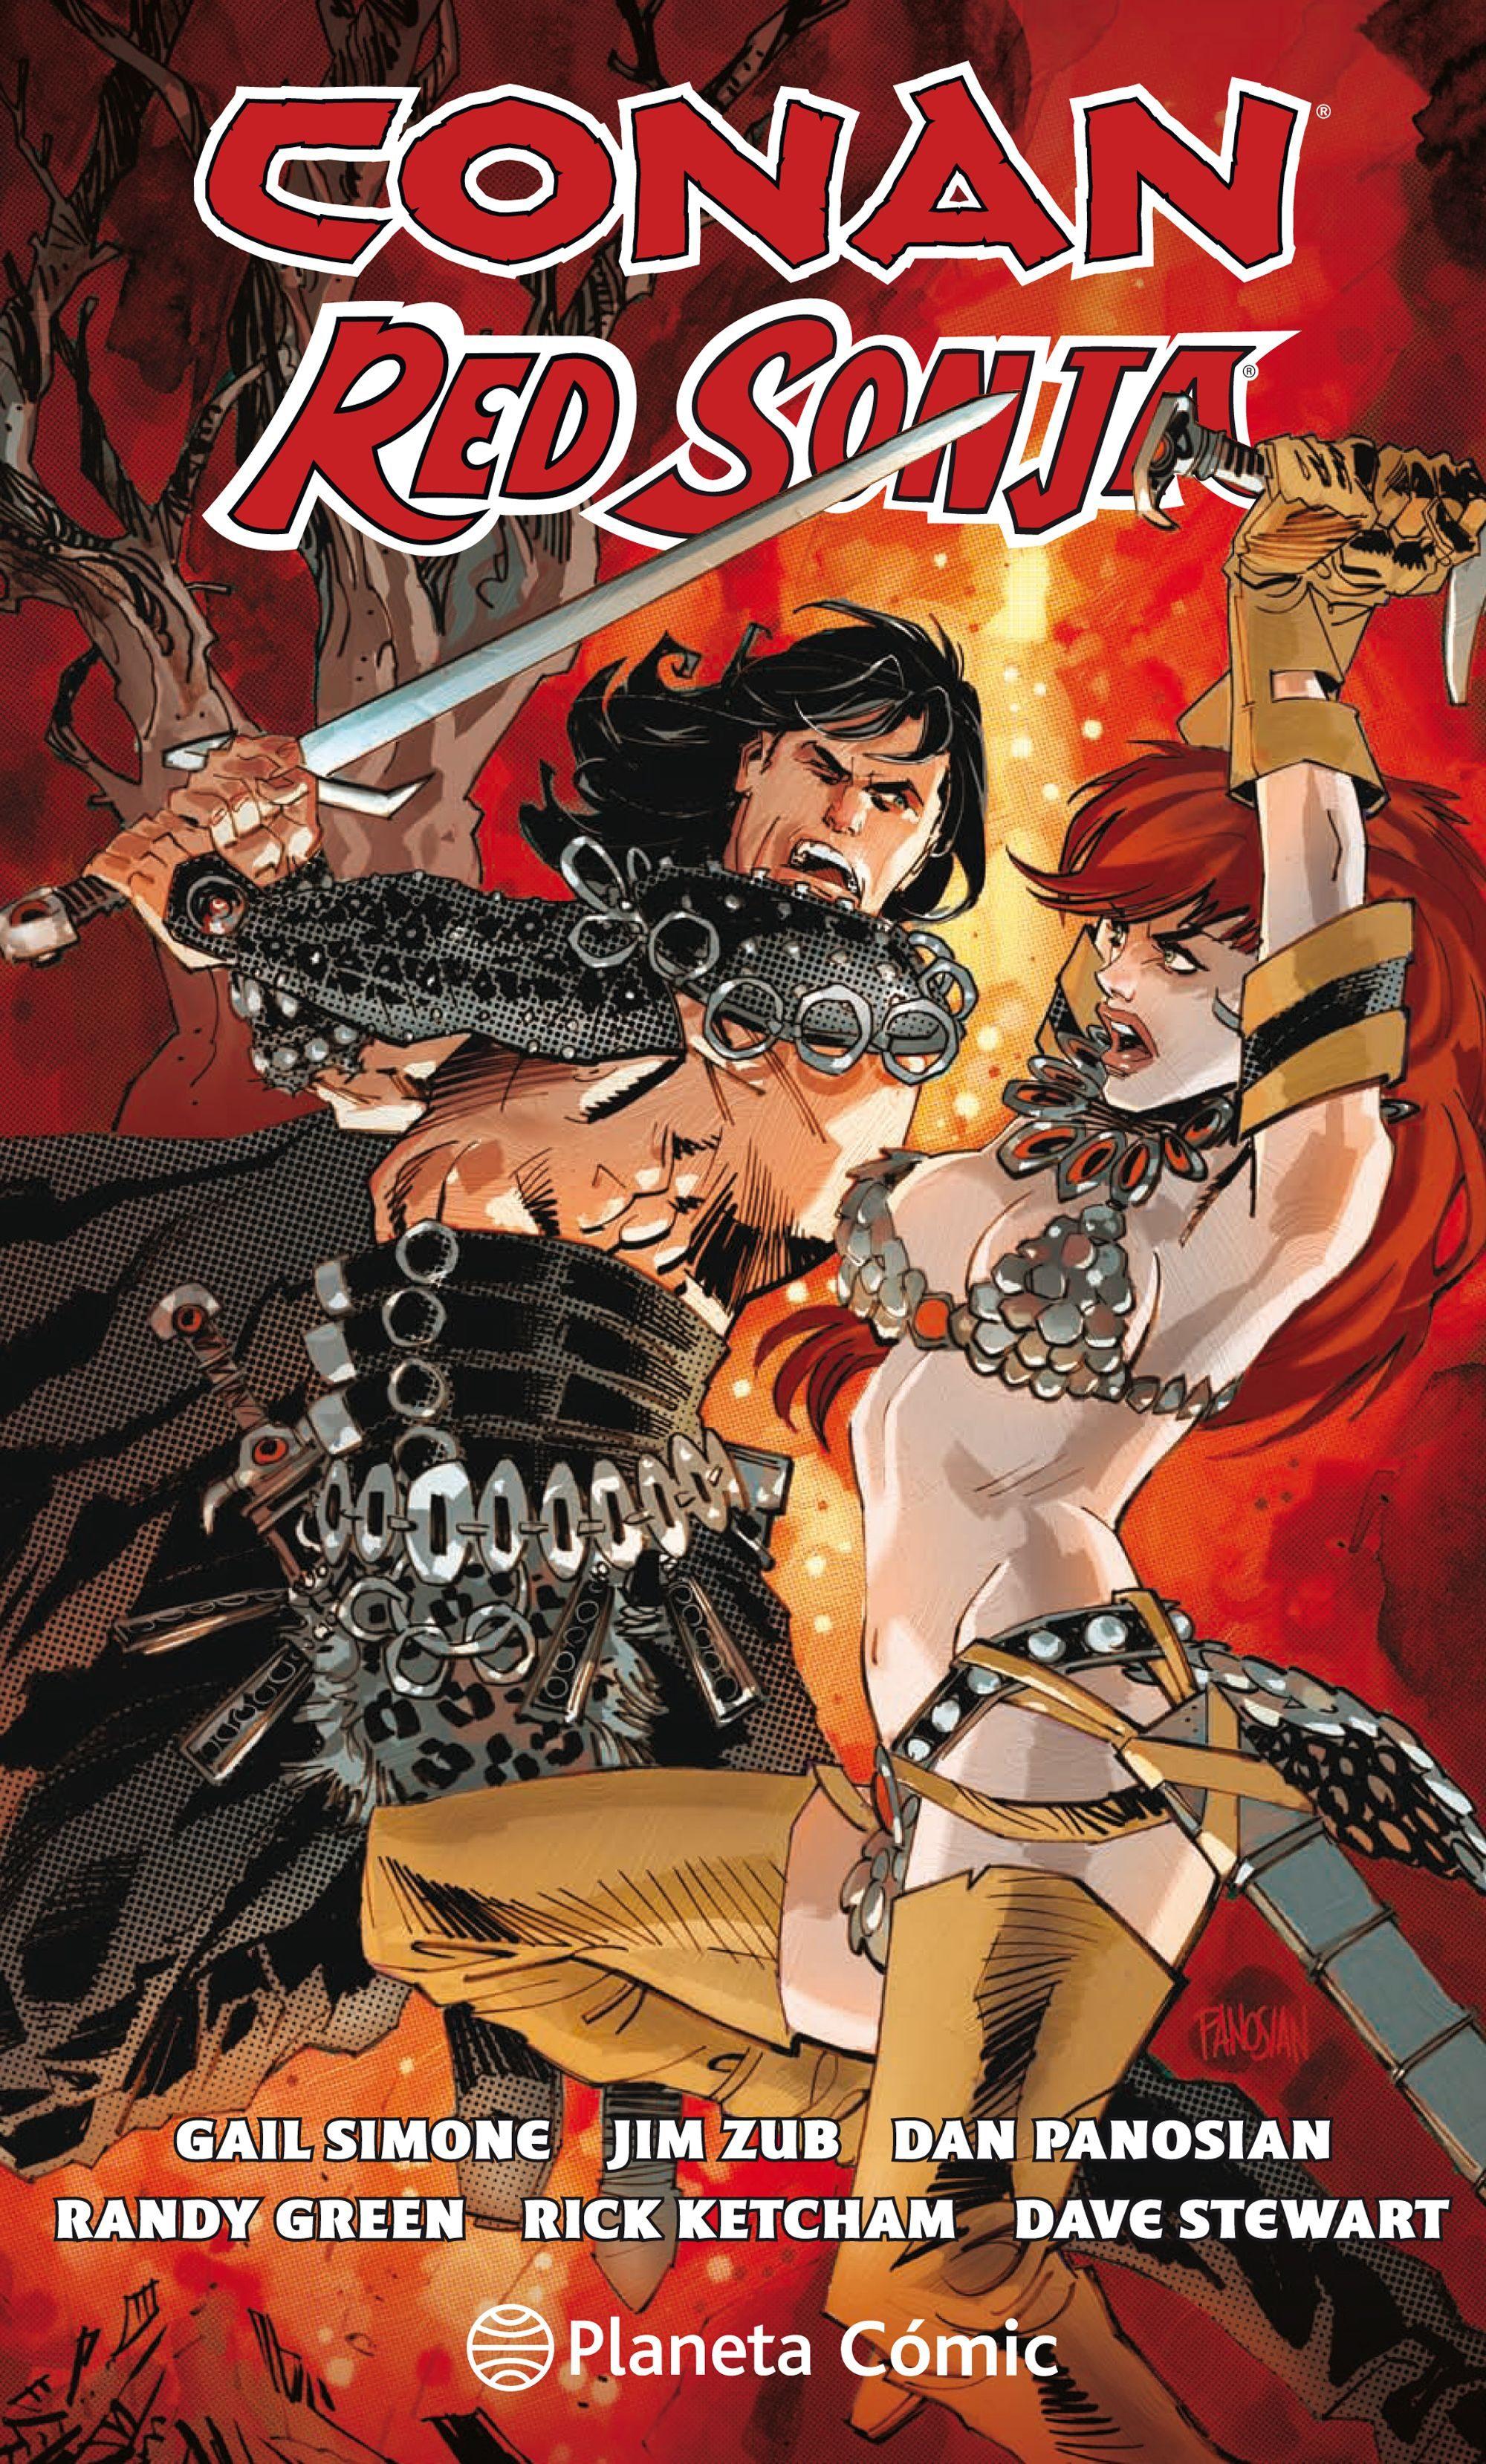 Conan y red Sonja - Gail Simone,Dan Panosian - Planeta Deagostini Cómics